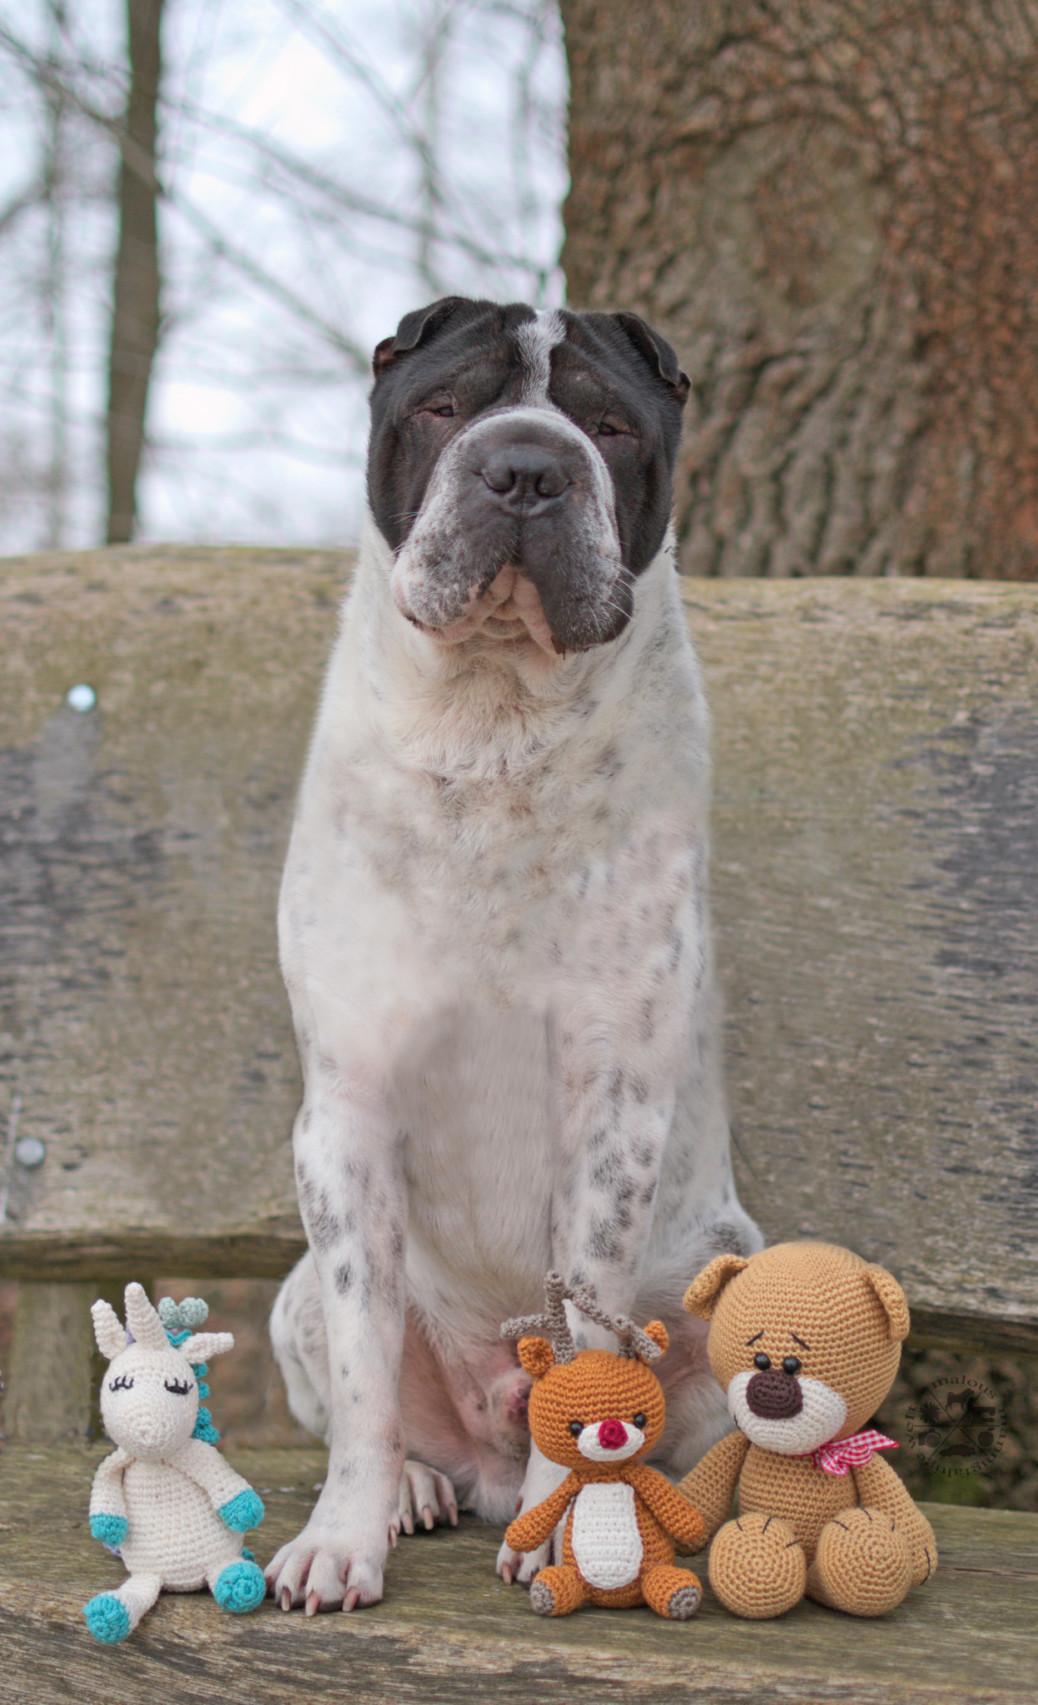 Tagebuch Kingston Hund Hundeblog Hunde Rentier Teddy Einhorn Ausflug Joggen Eschede Shar Pei Rabaukenbande Pubertät Hormone Musterknabe Erziehung Begegnungen Winsen